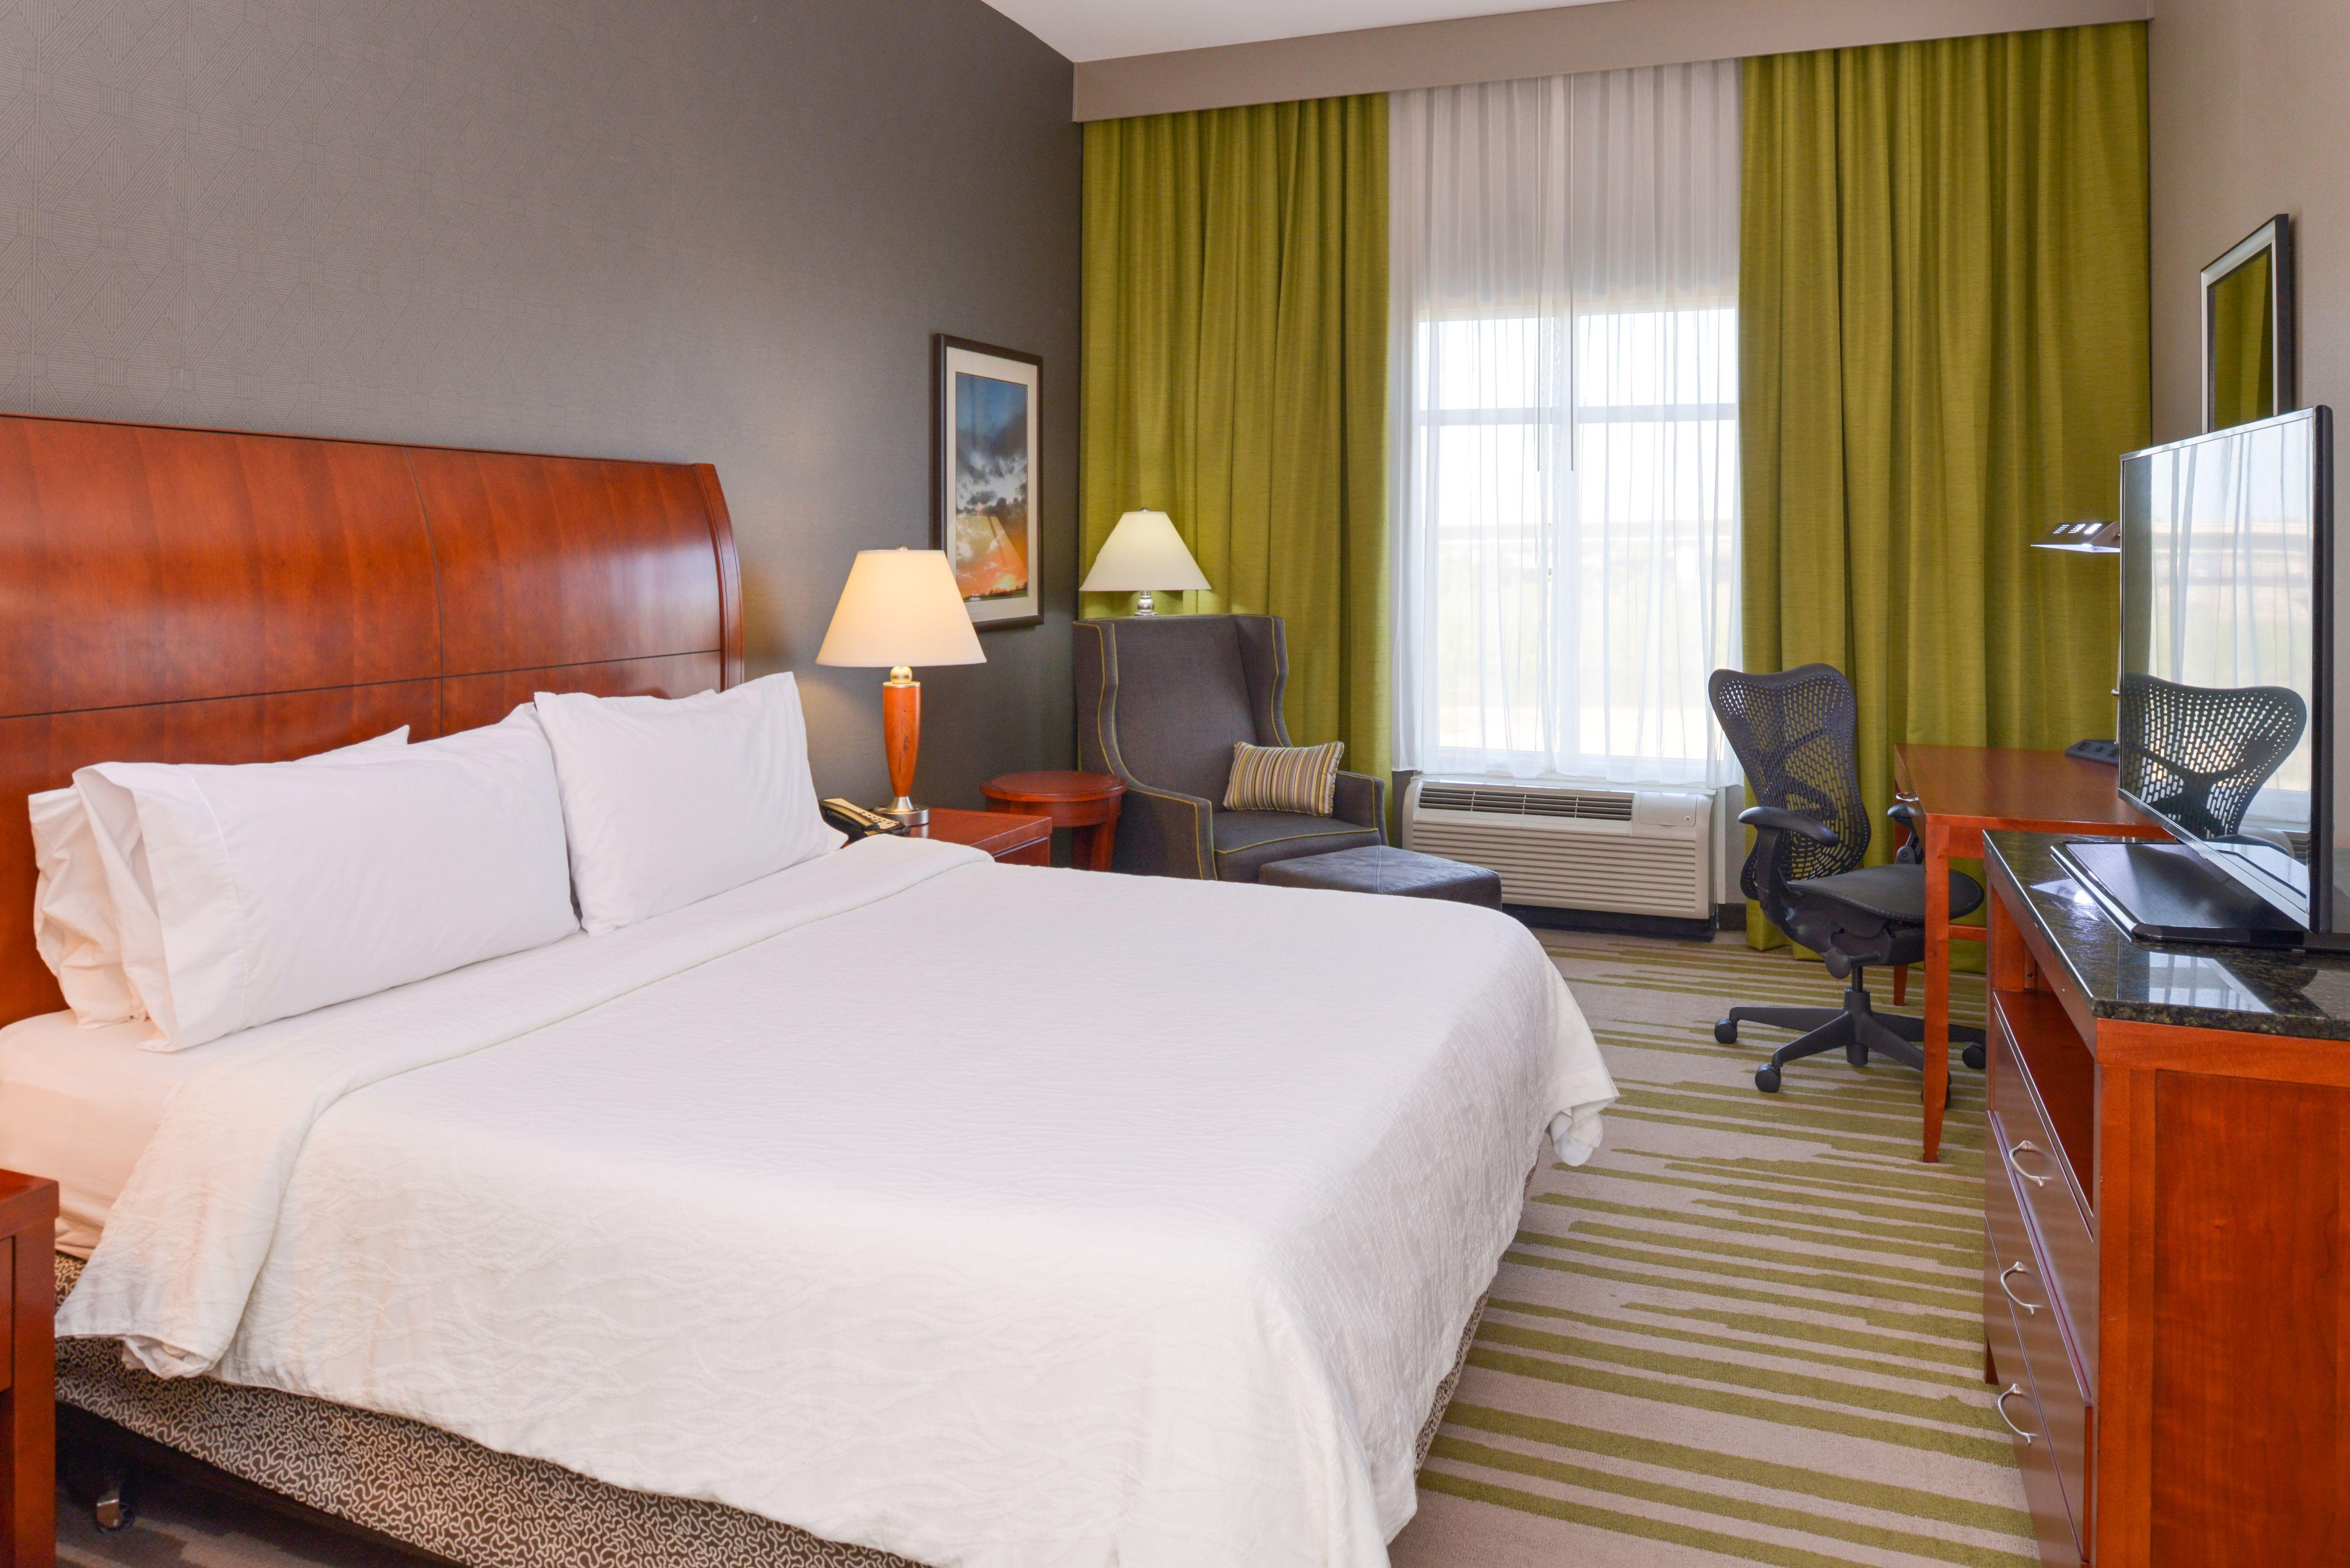 Superb Stay In A Spacious King Guest Room At The Hilton Garden Inn Yuma Pivot  Point Hotel.